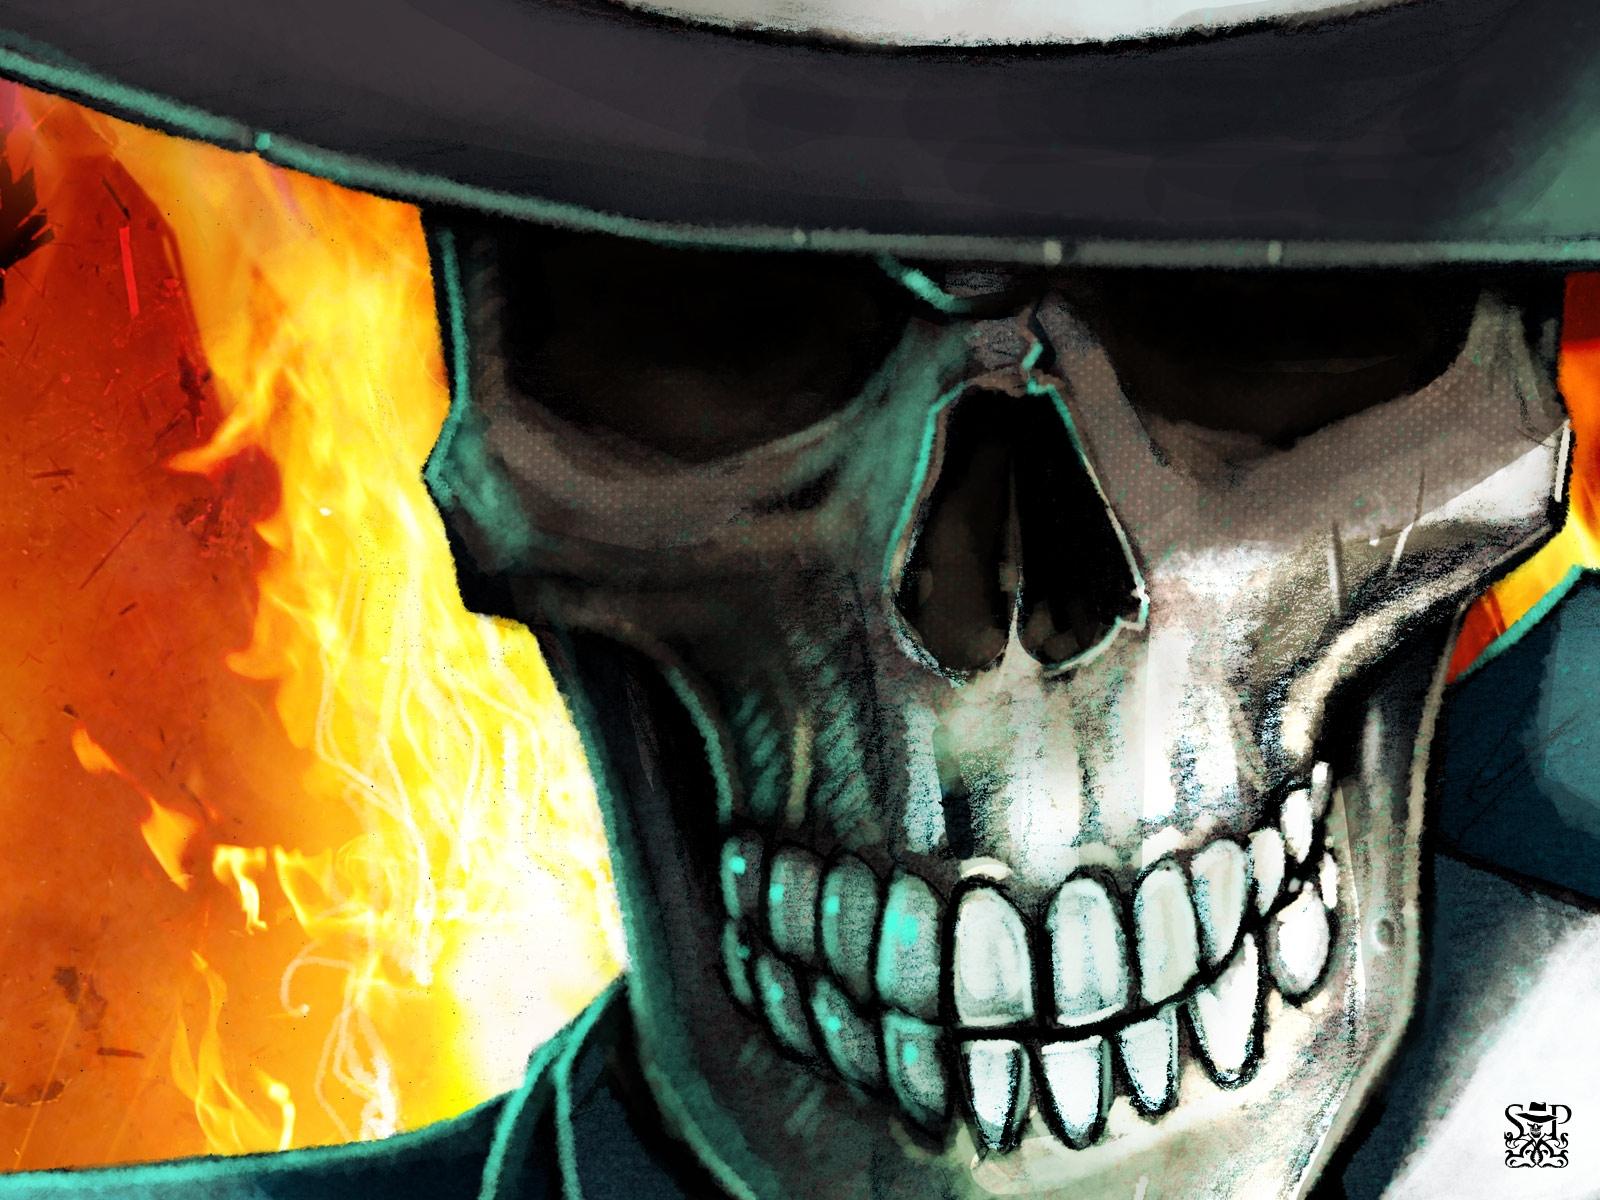 uporn gratis skullduggery